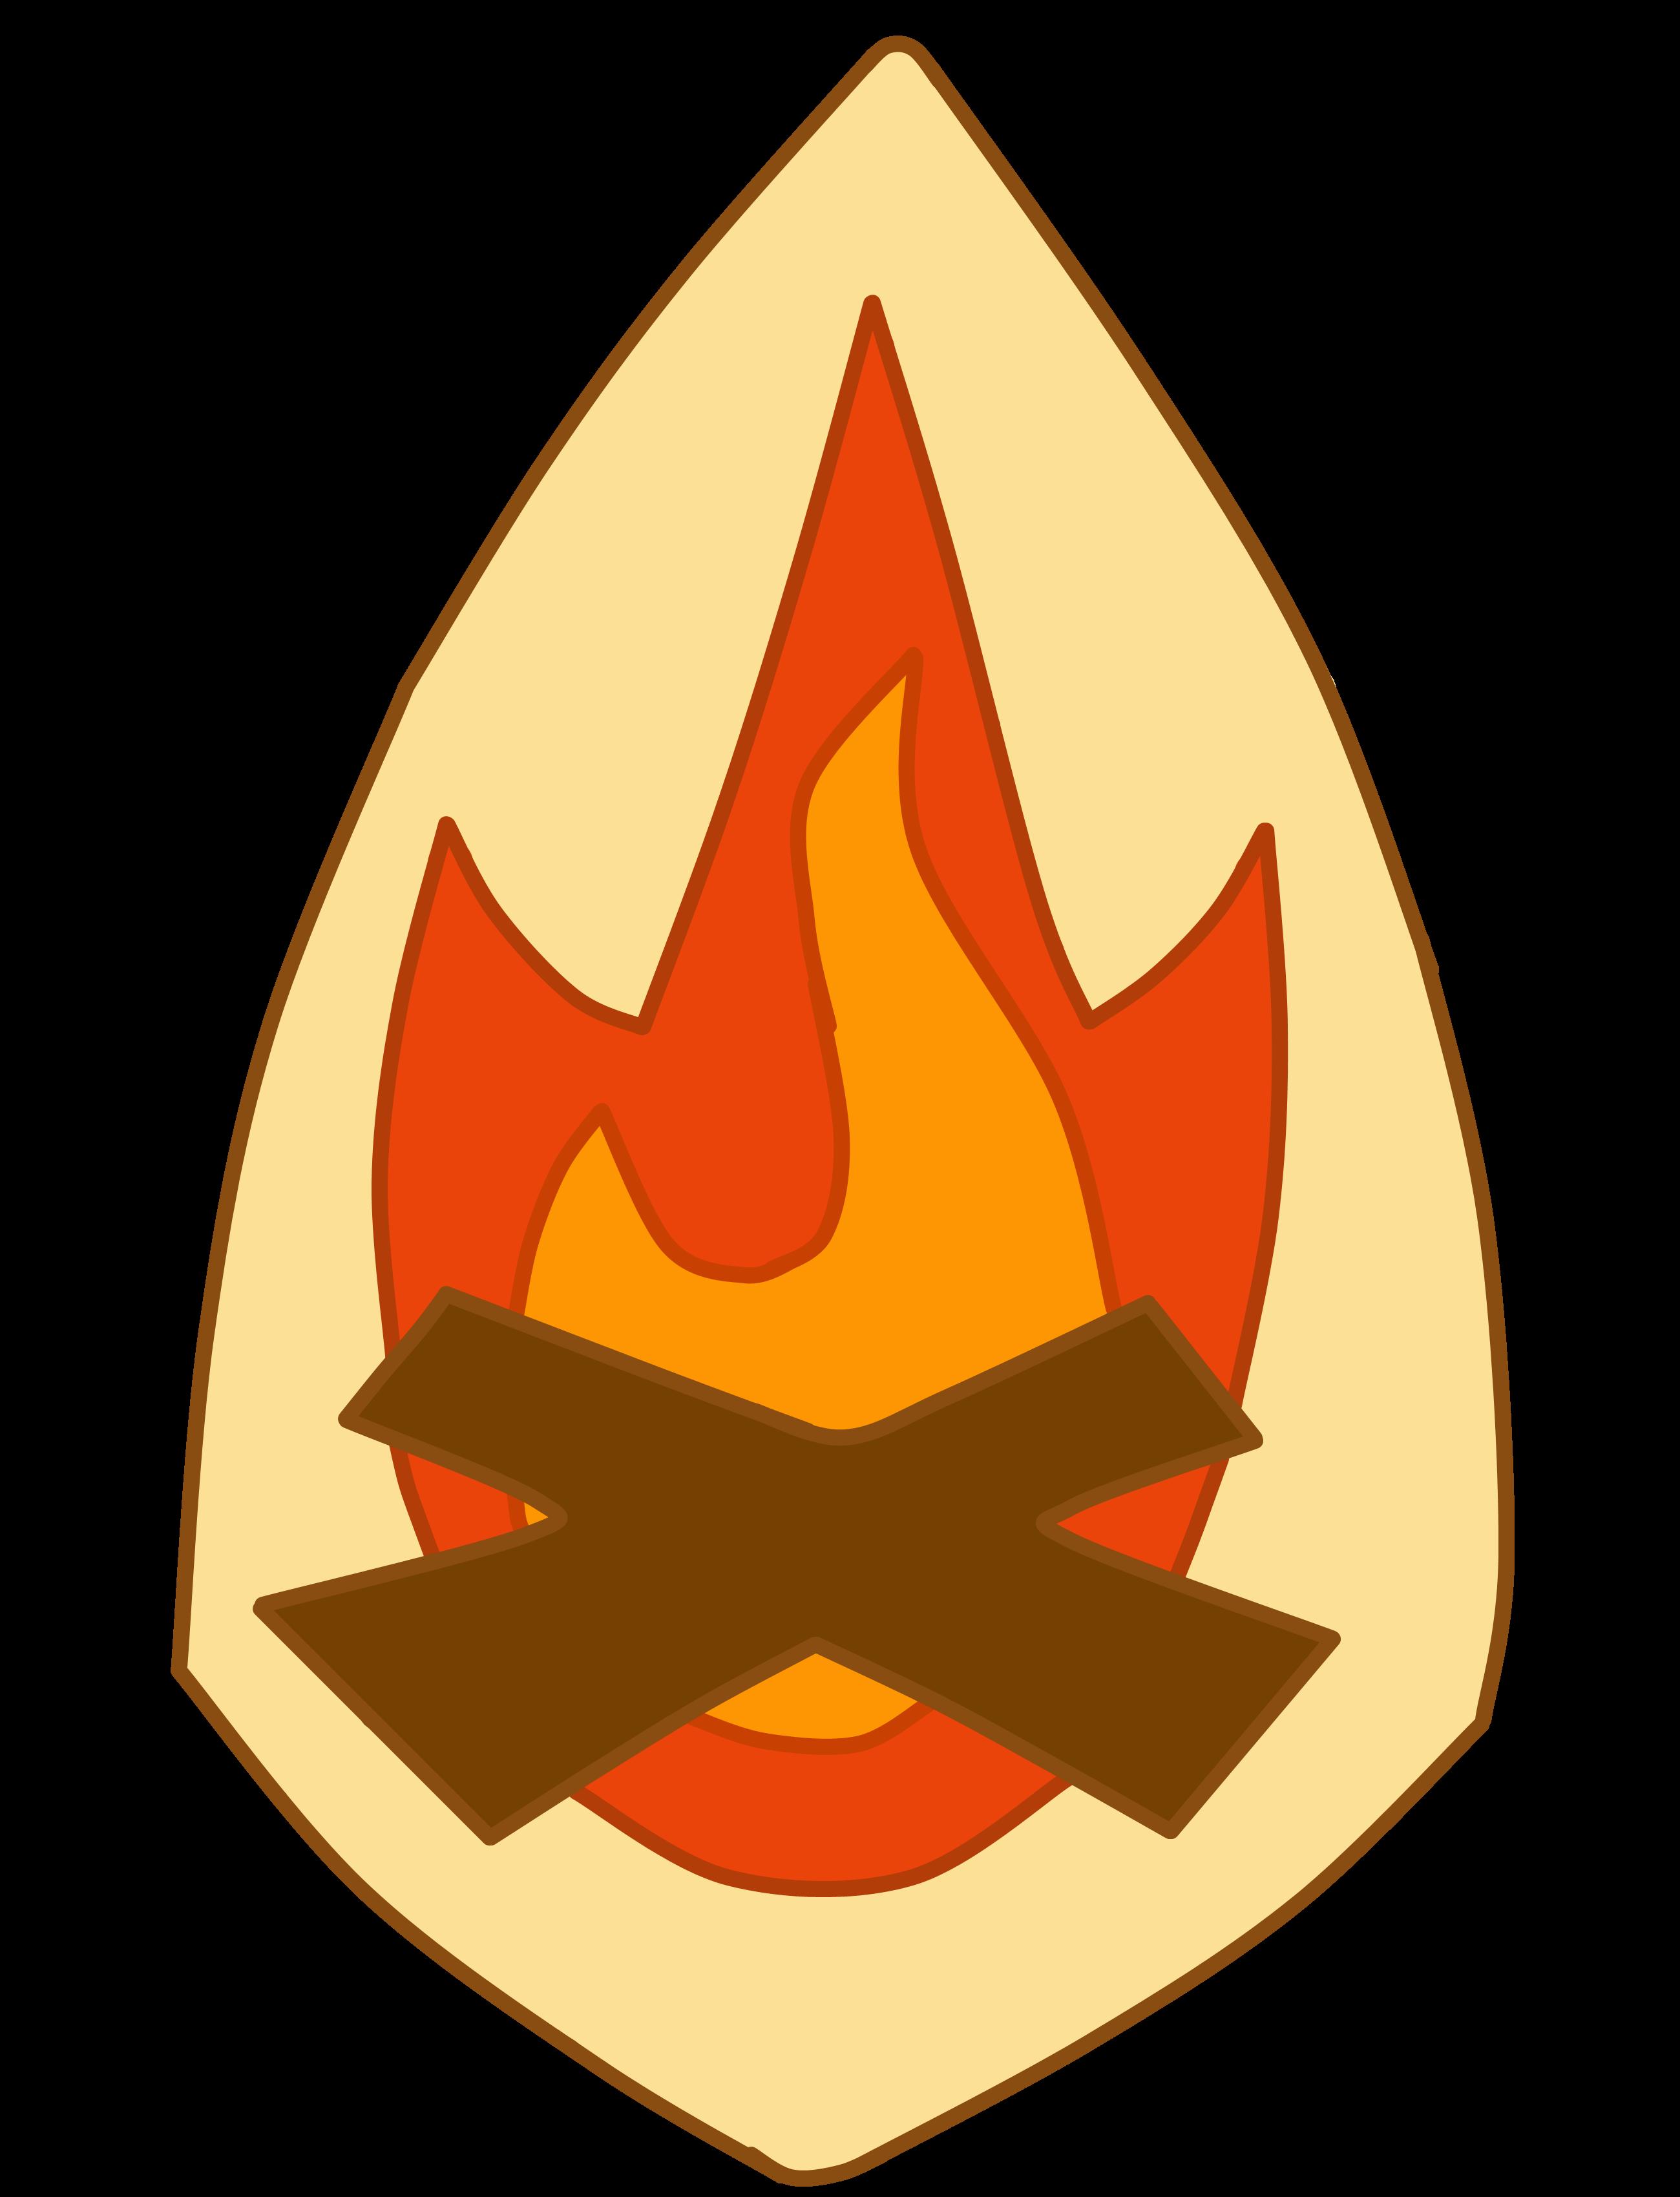 Smores clipart campfire. Bonfire fireside pencil and